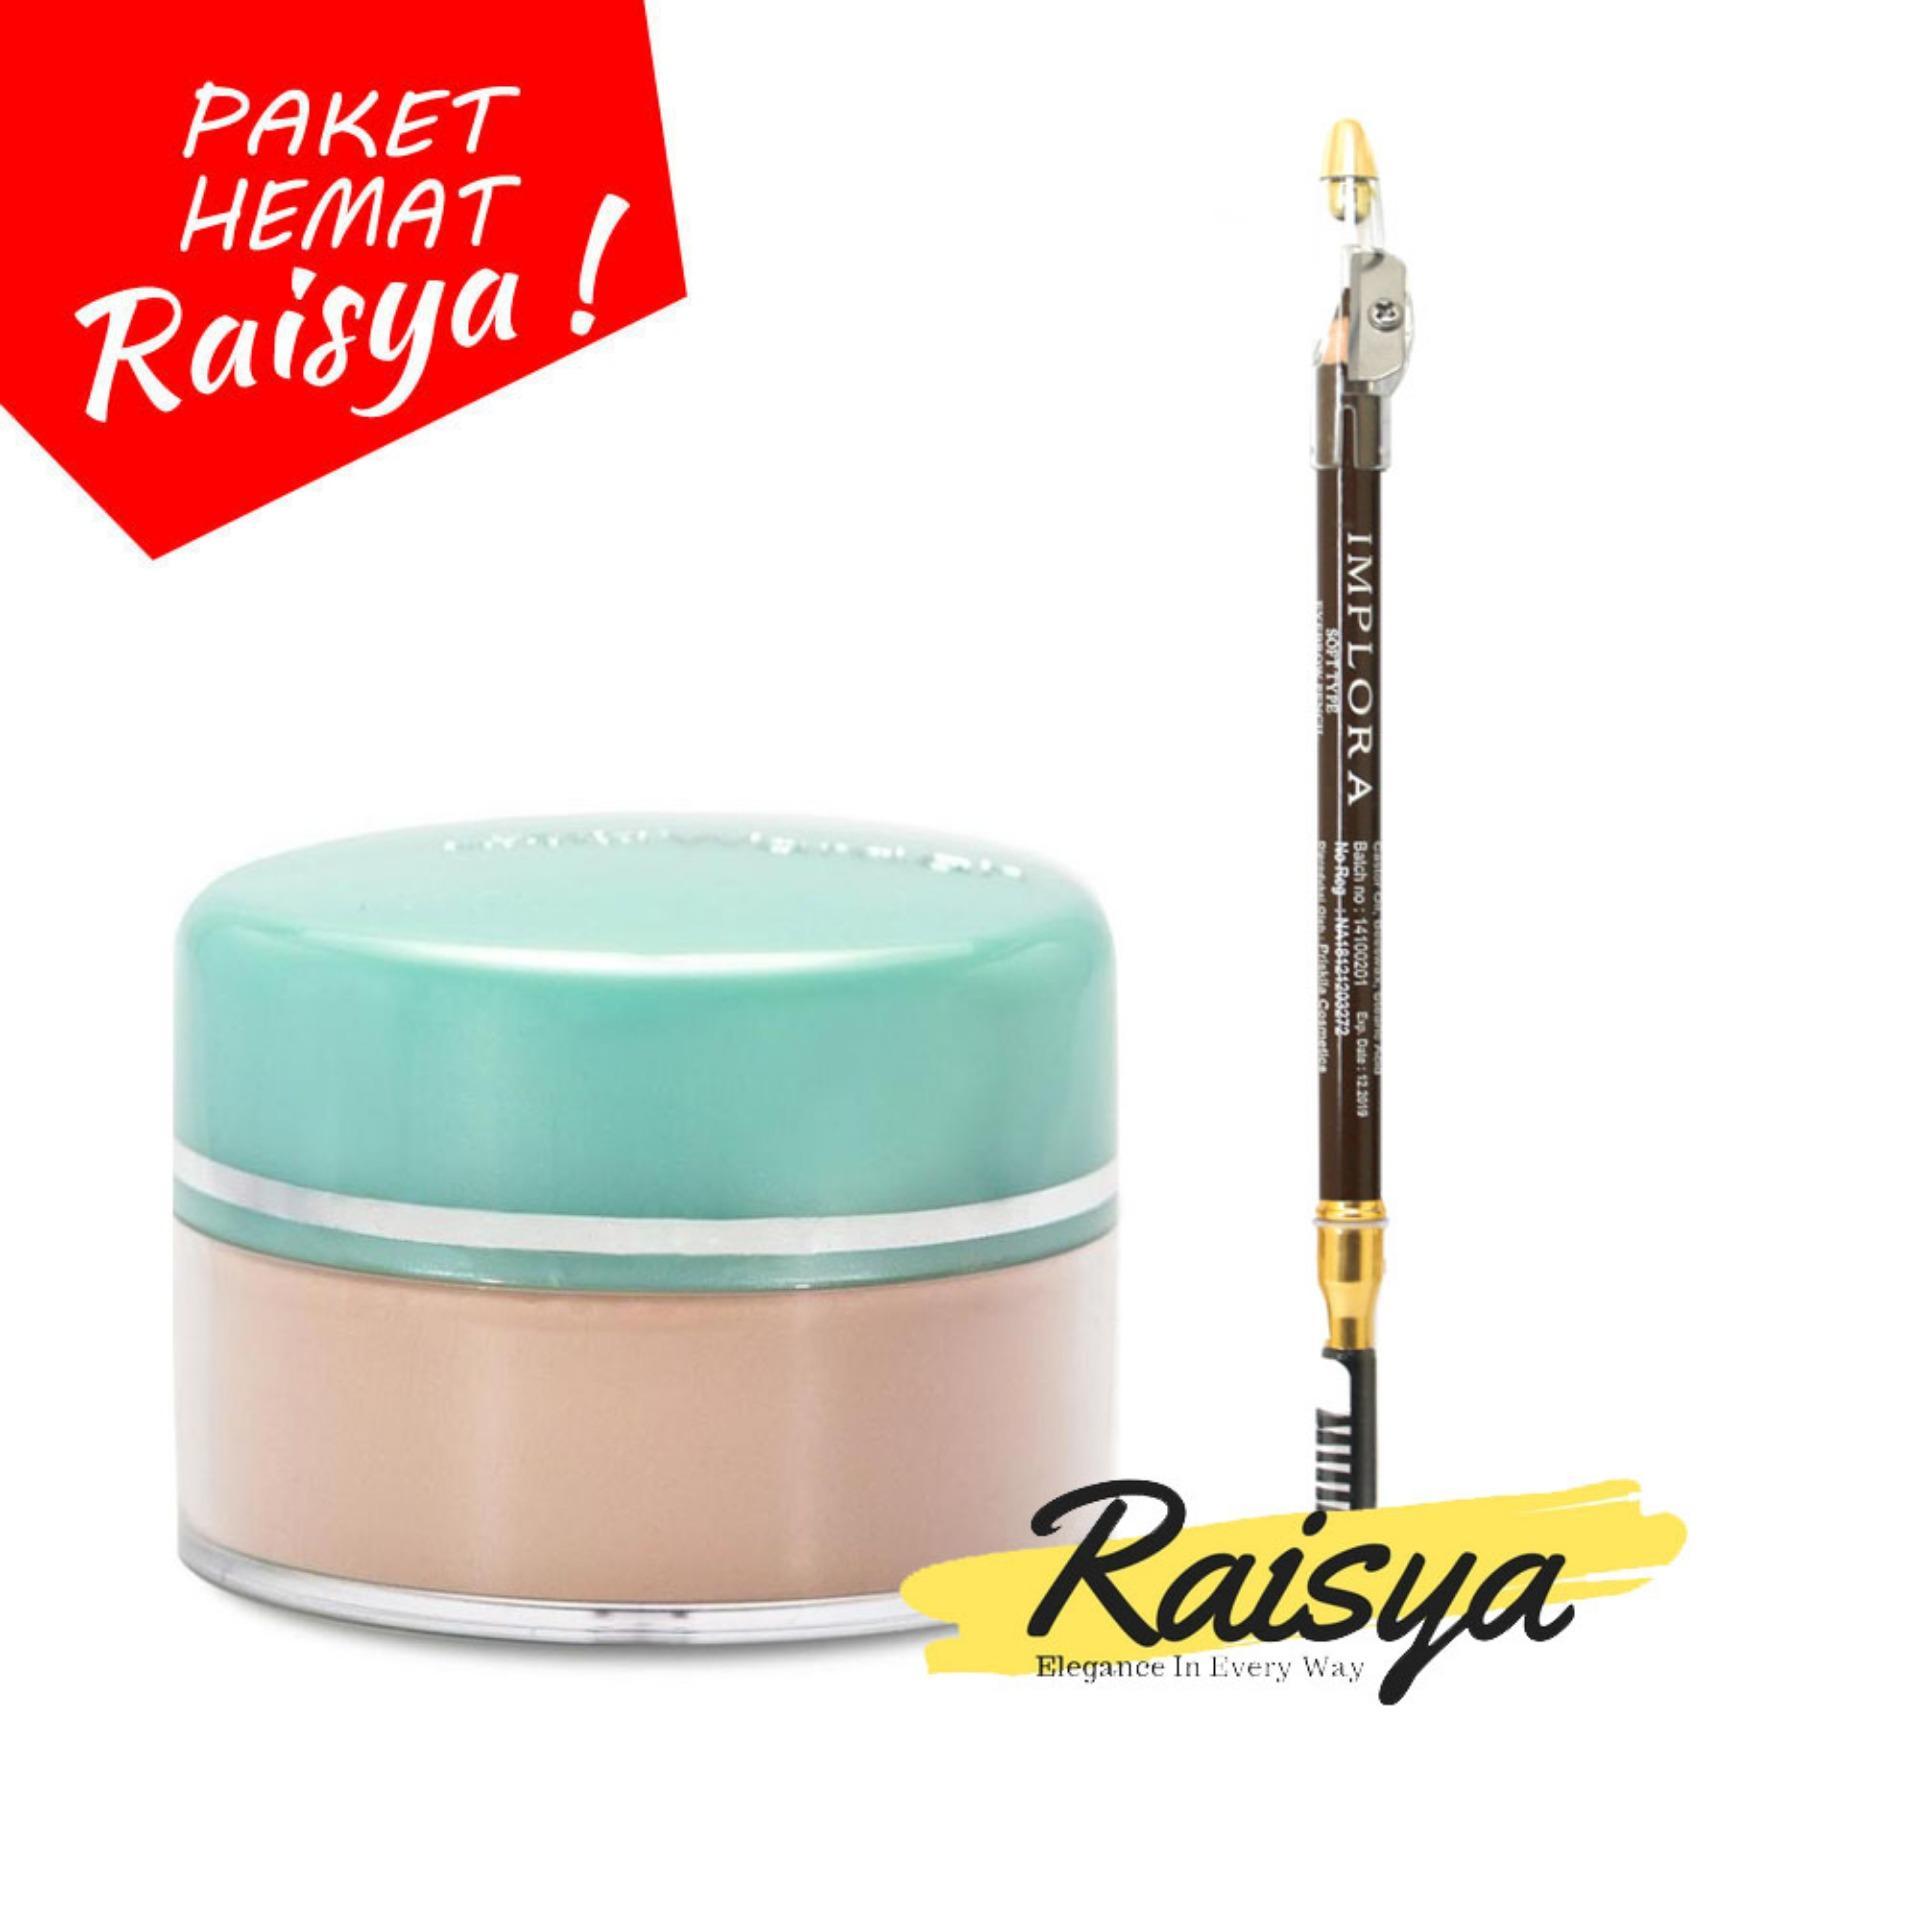 Wardah Everyday Luminous Face Powder - Bedak Tabur - 04 Natural Free Implora Pensil Alis Coklat Resmi BPOM